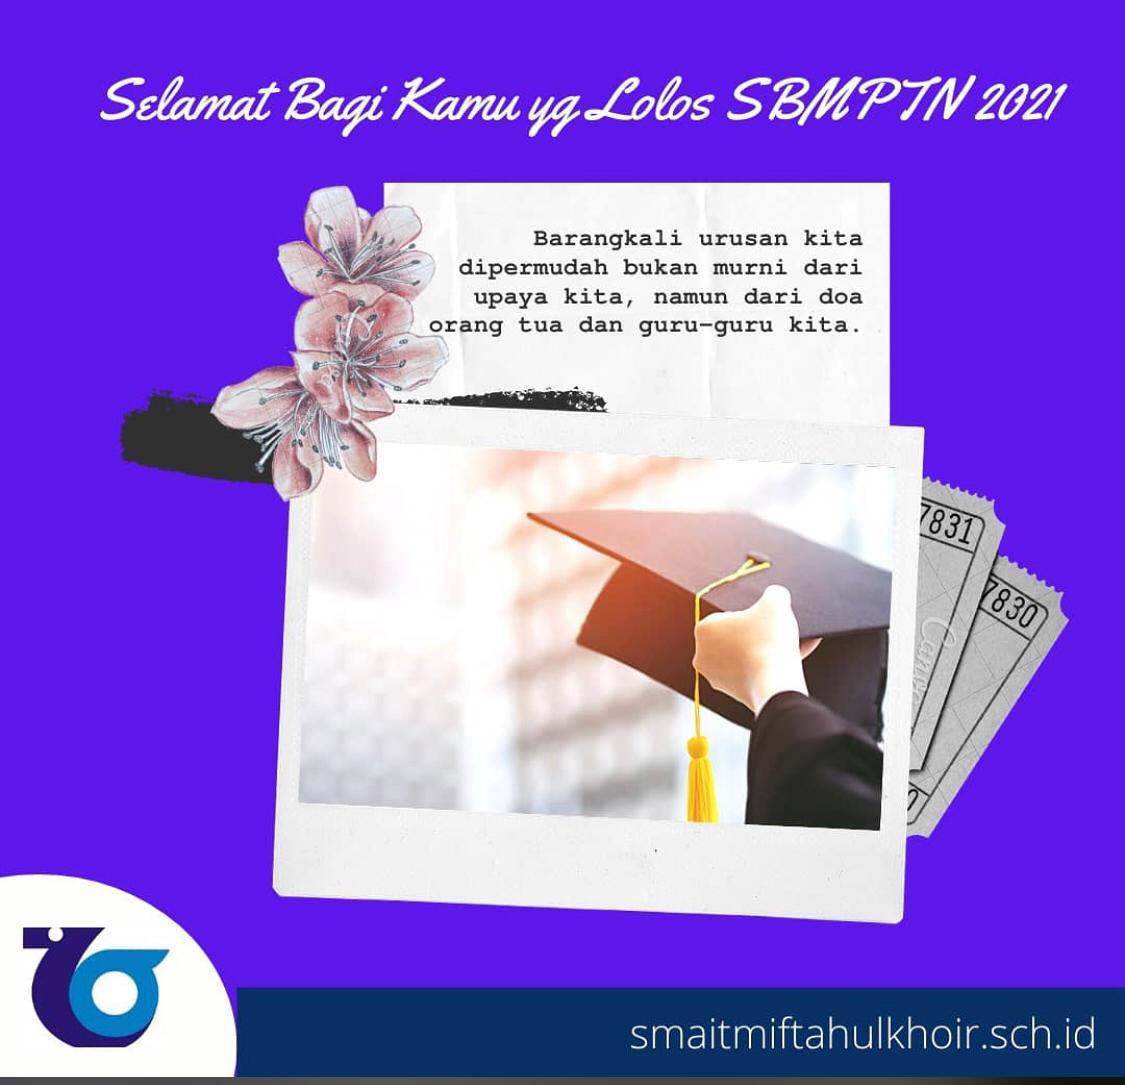 Kelulusan SBMPTN 2021